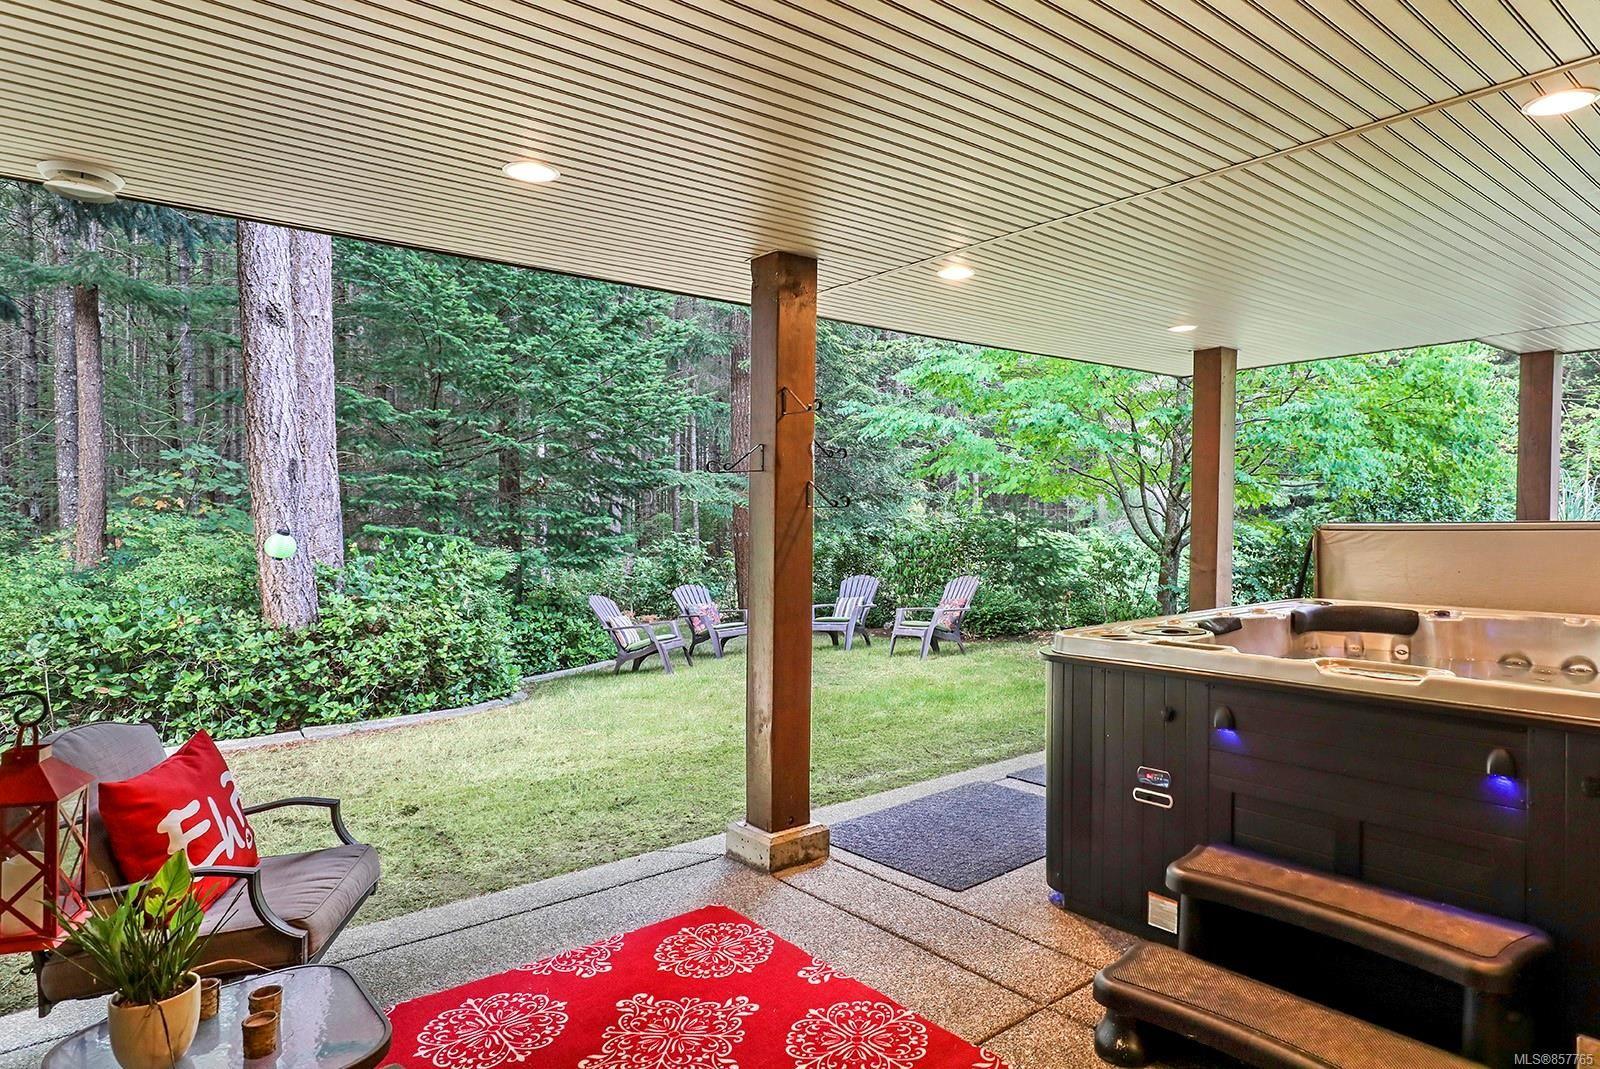 Photo 44: Photos: 1516 Highridge Dr in : CV Comox (Town of) House for sale (Comox Valley)  : MLS®# 857765